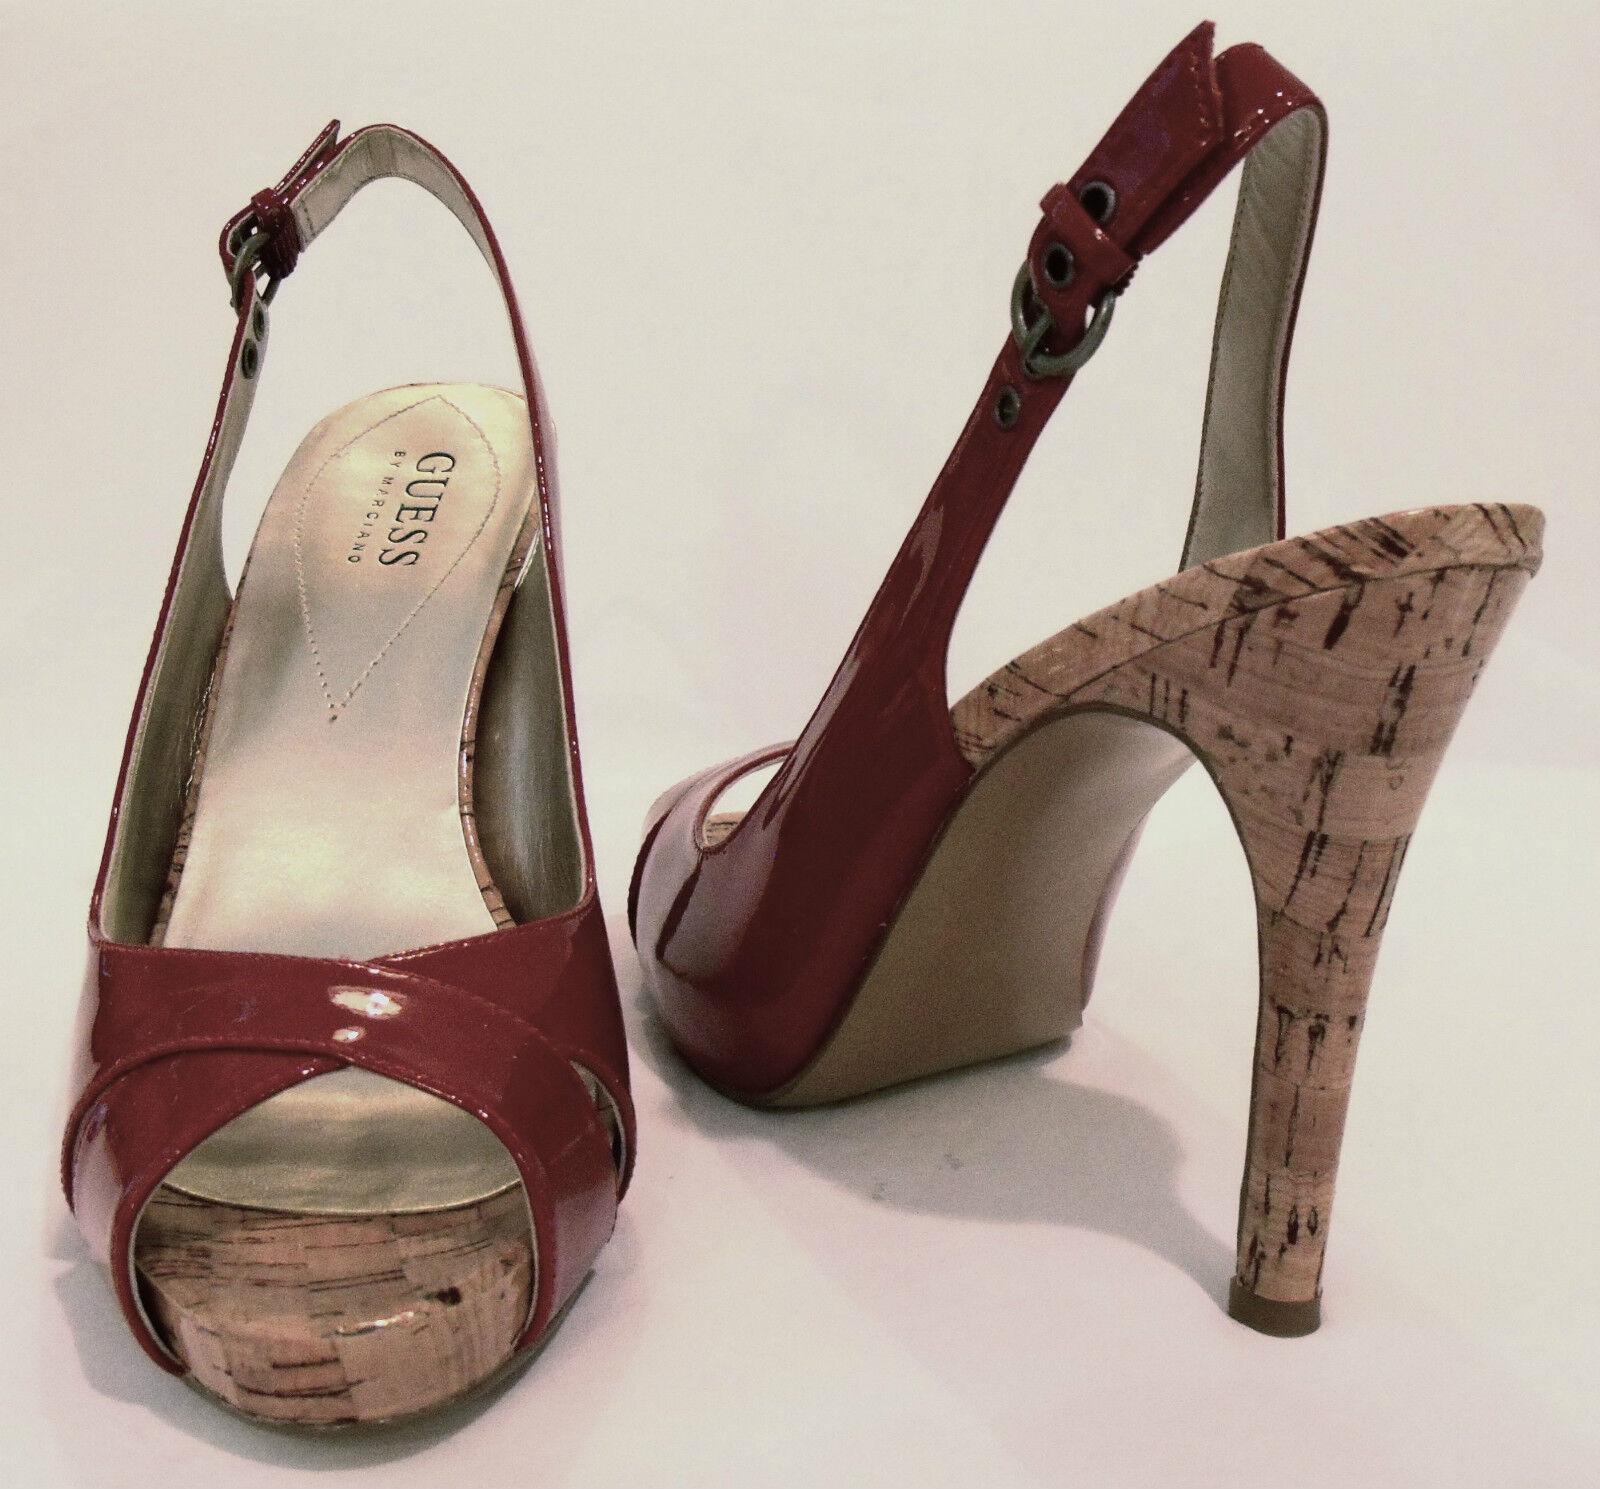 GUESS byMarciano(9.)4 inch Cork Heels ROTPat.LthrOpenToe DressSandale7.5MNWB.